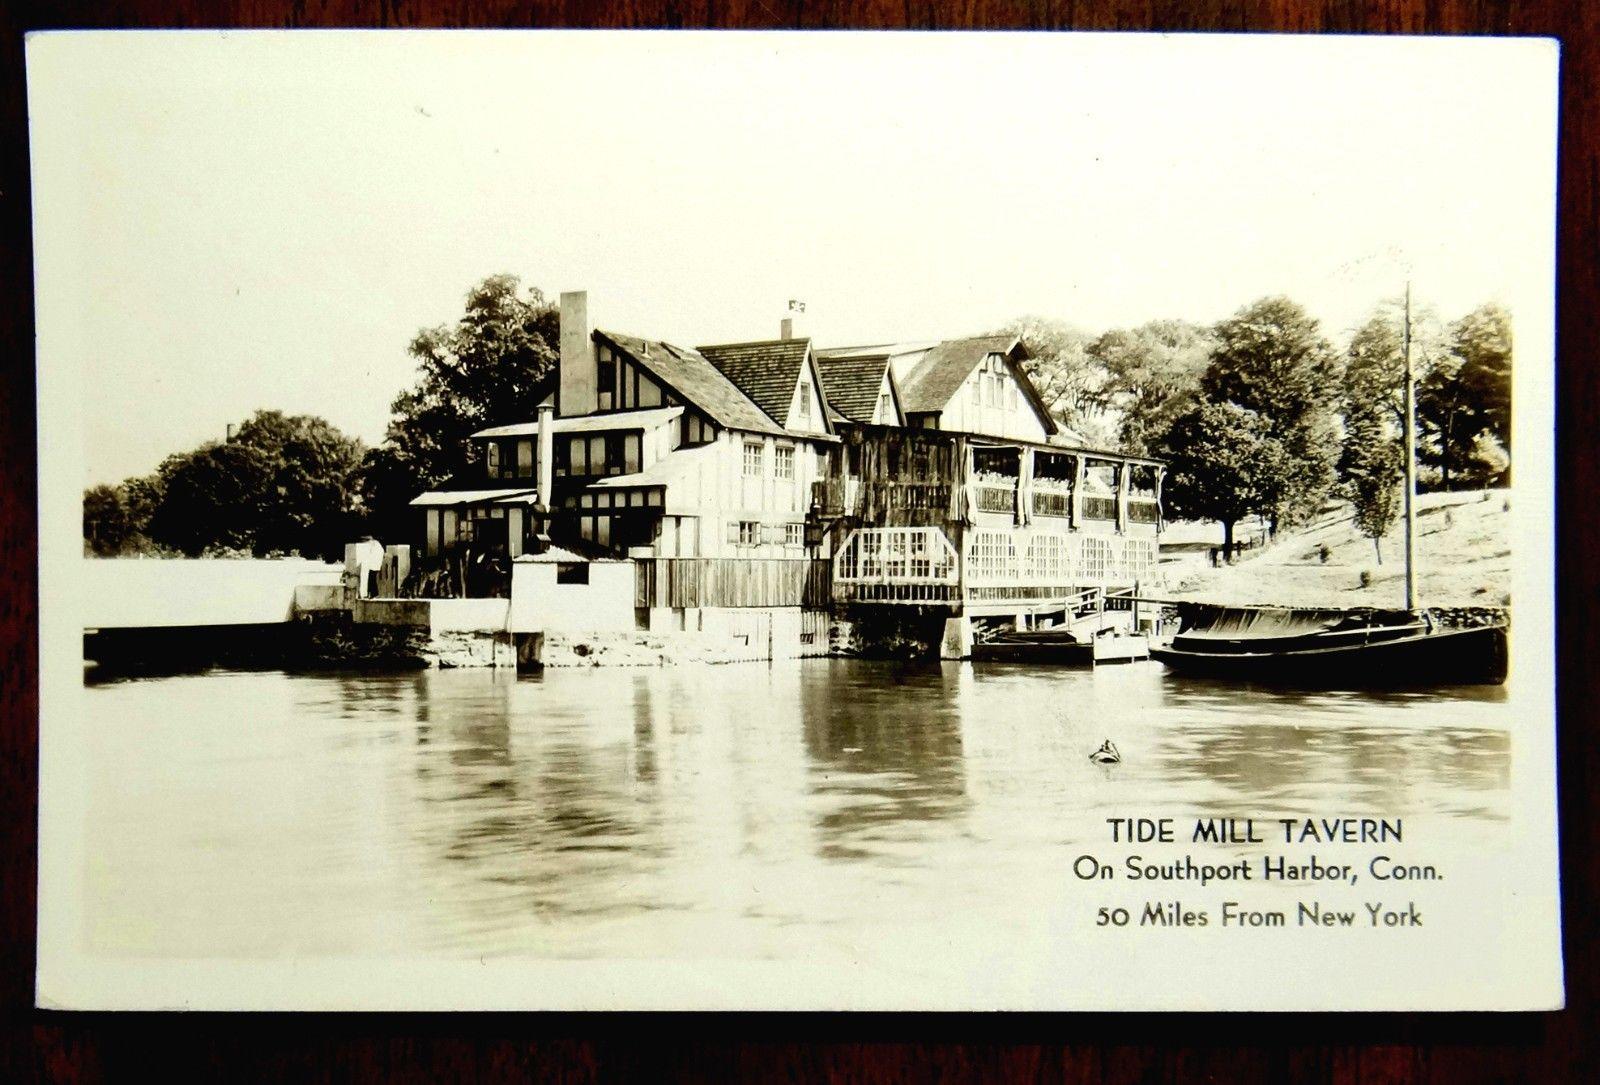 Filetide Mill Tavern Fairfield Ctg Wikimedia Commons